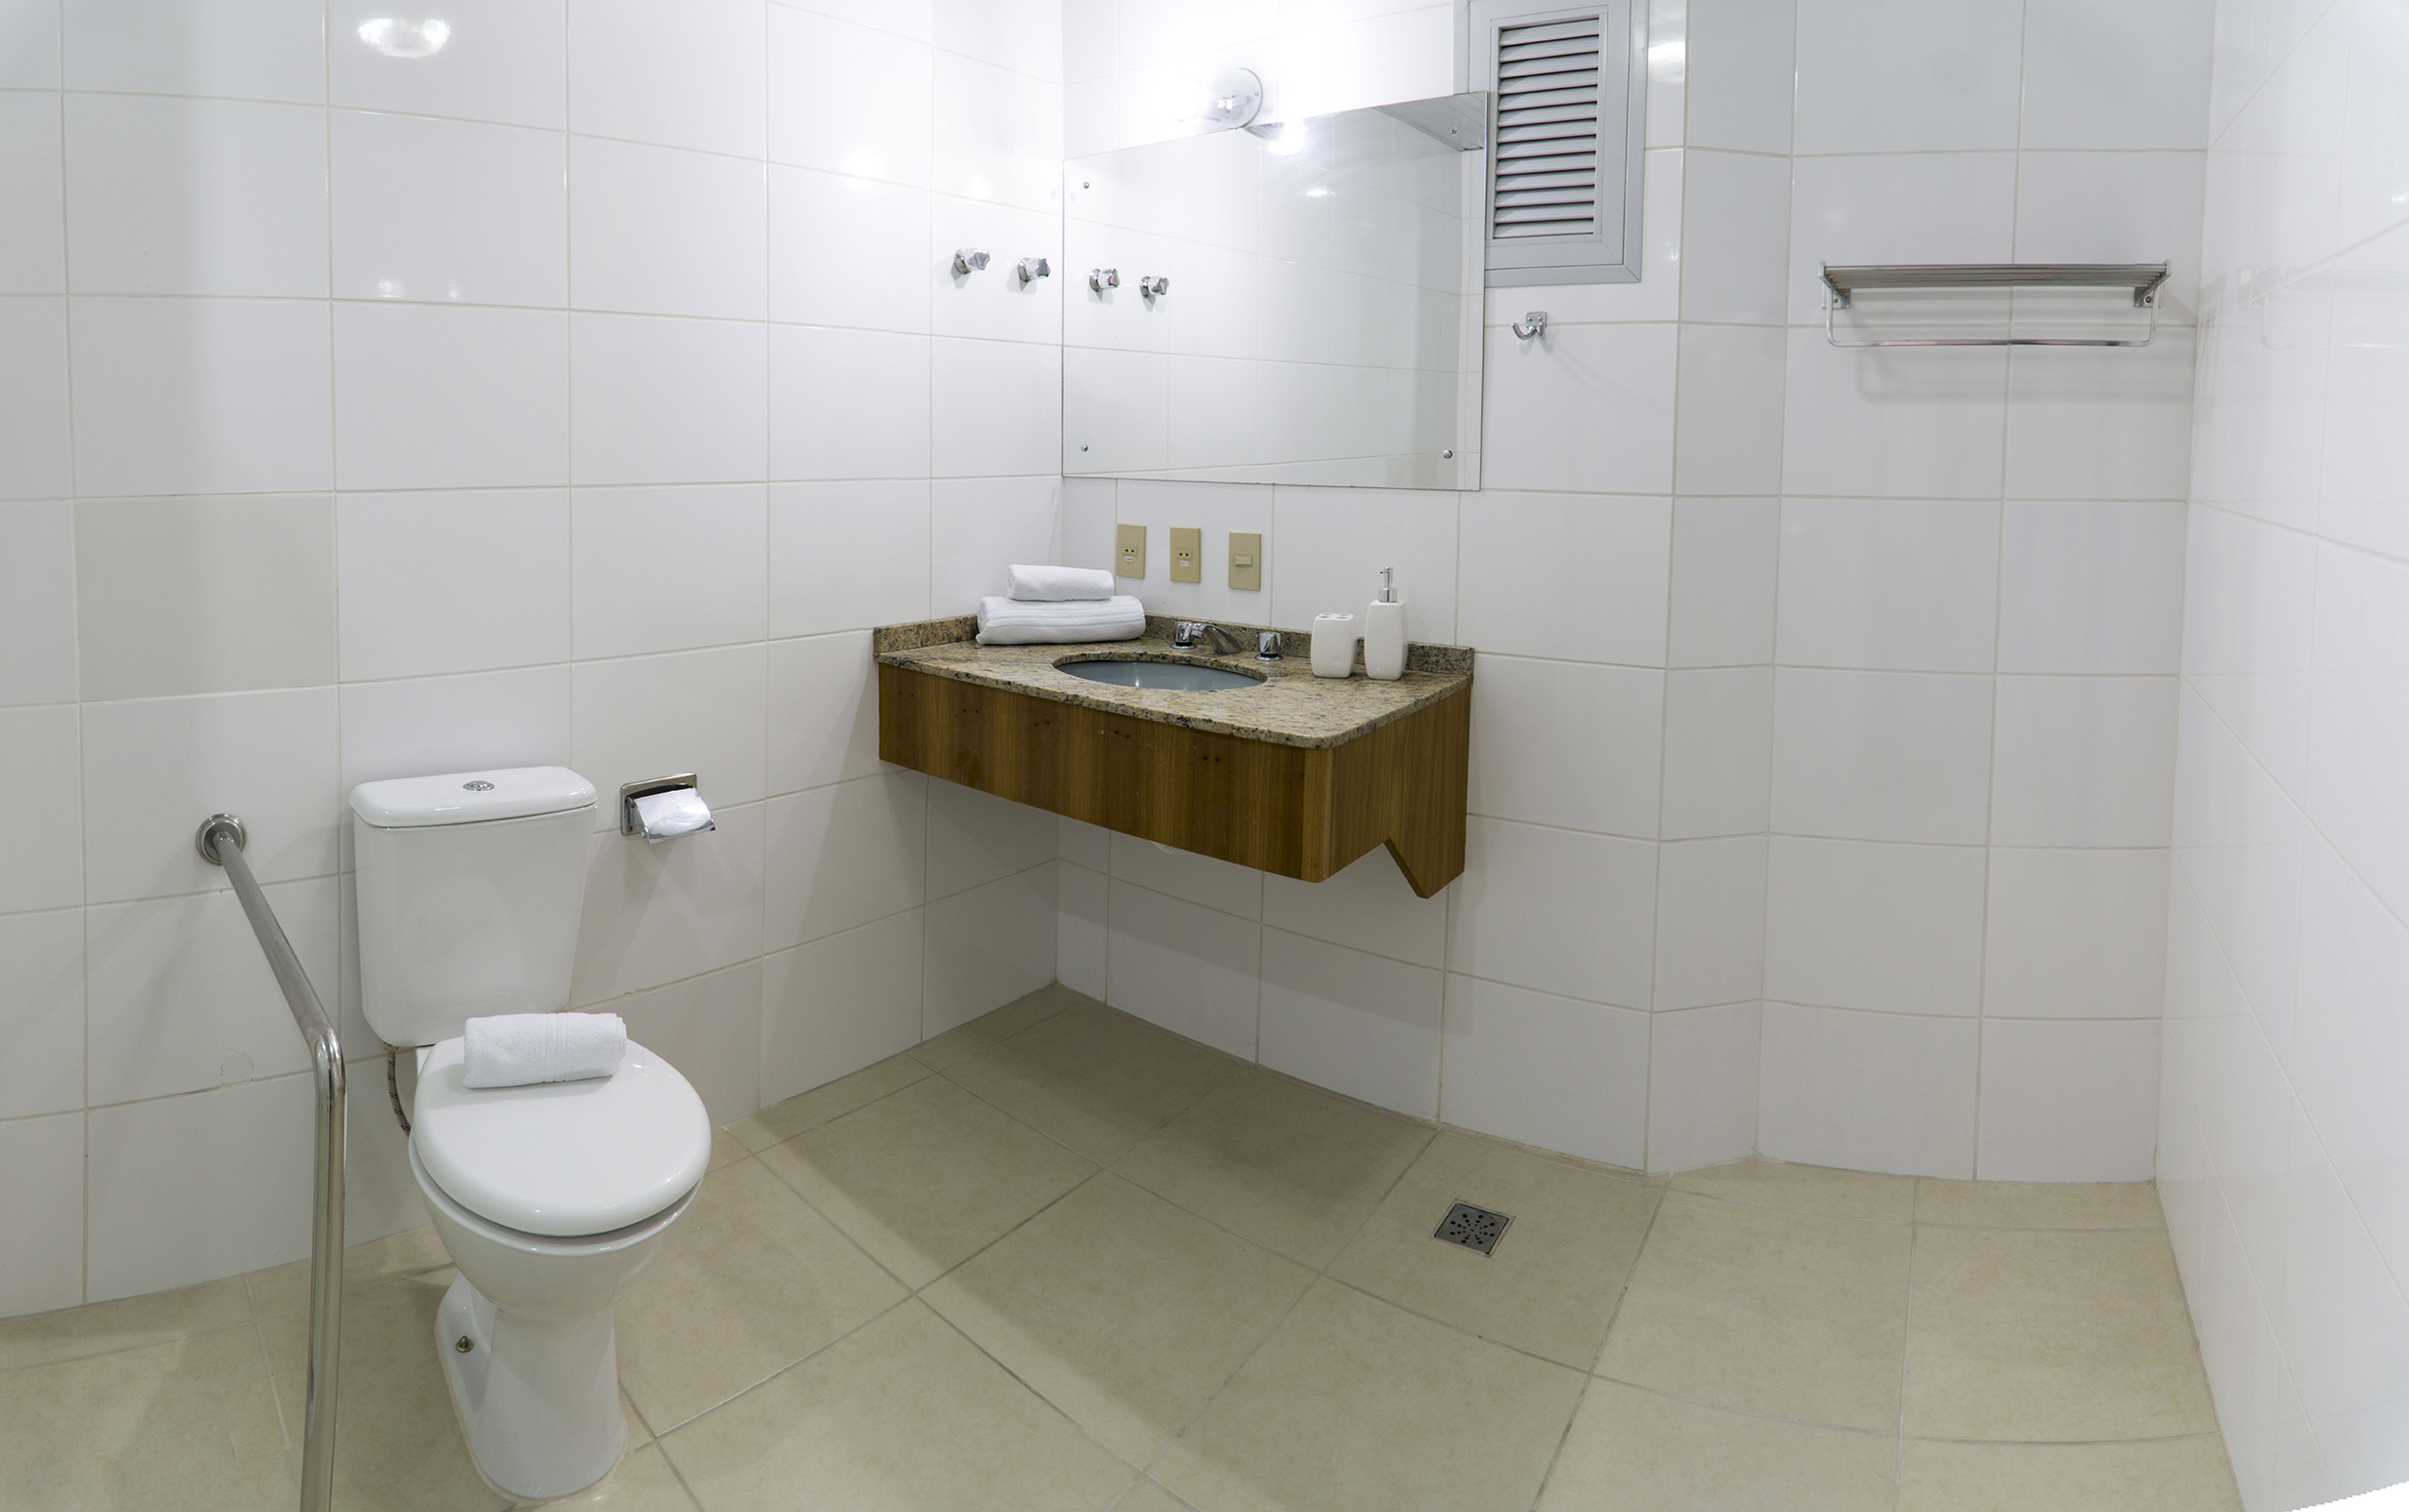 banheiro-baixa.jpg